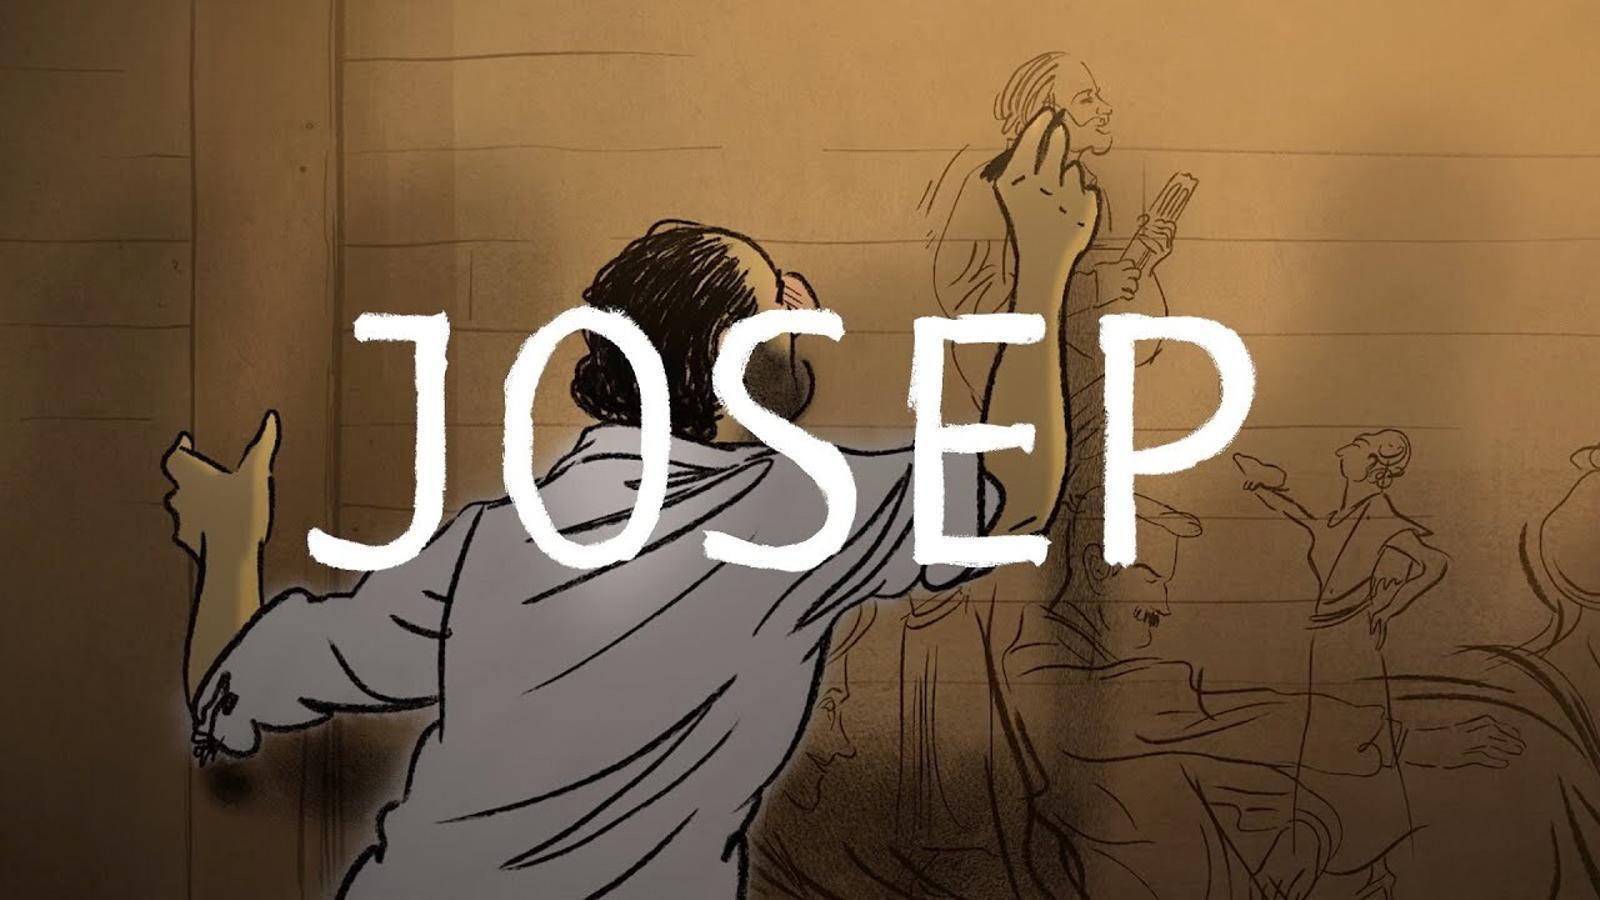 Tràiler de 'Josep'